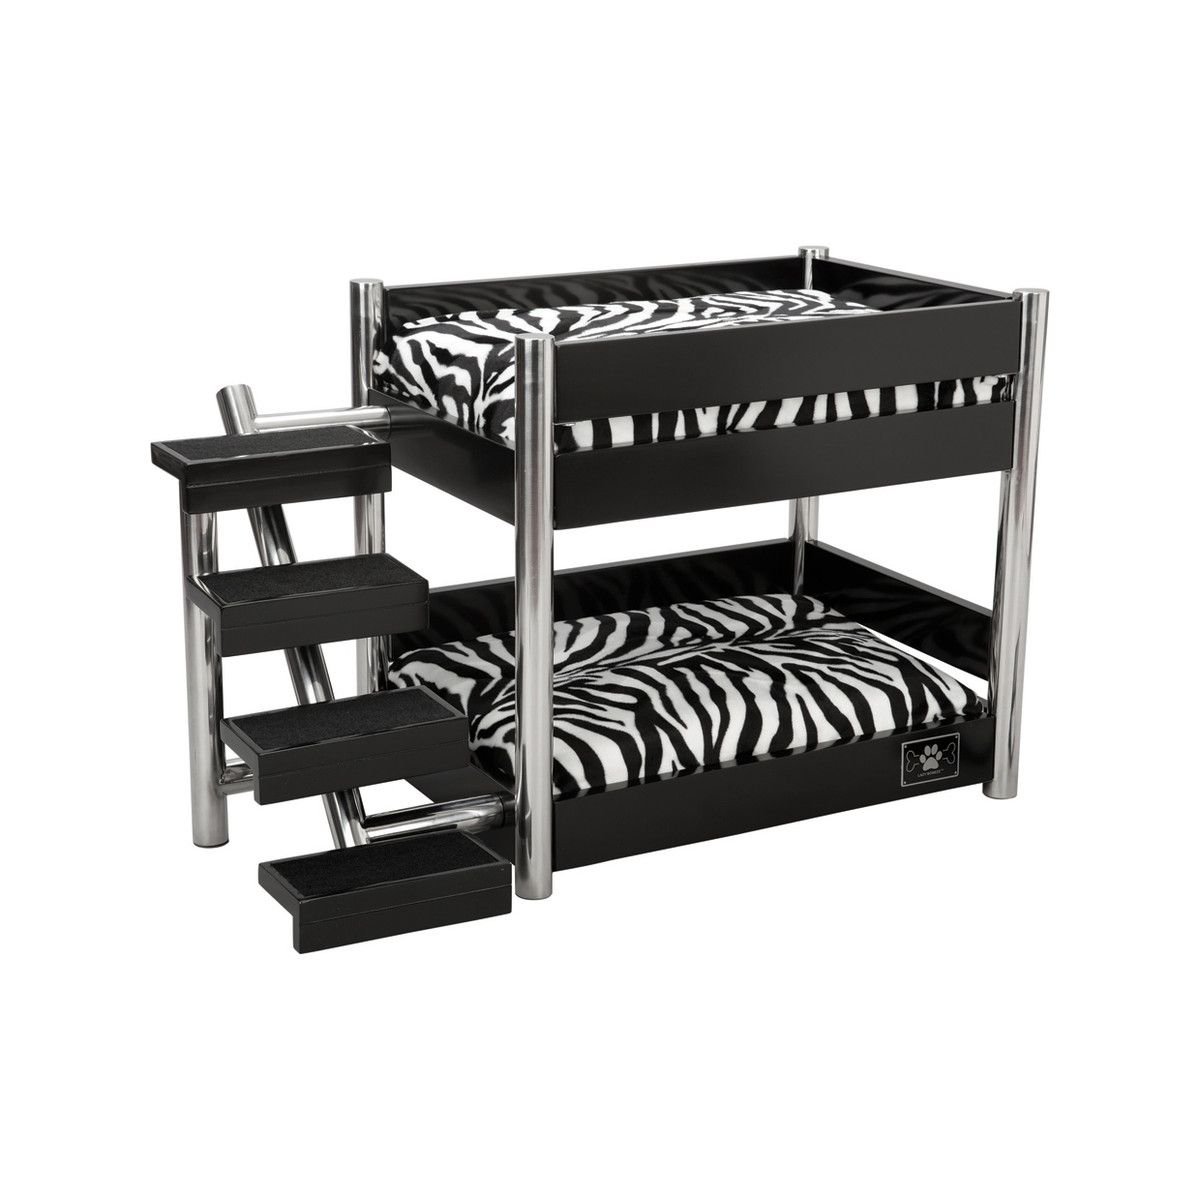 LazyBonezz Metropolitan Pet Bunk Bed 0fbc7f2a9